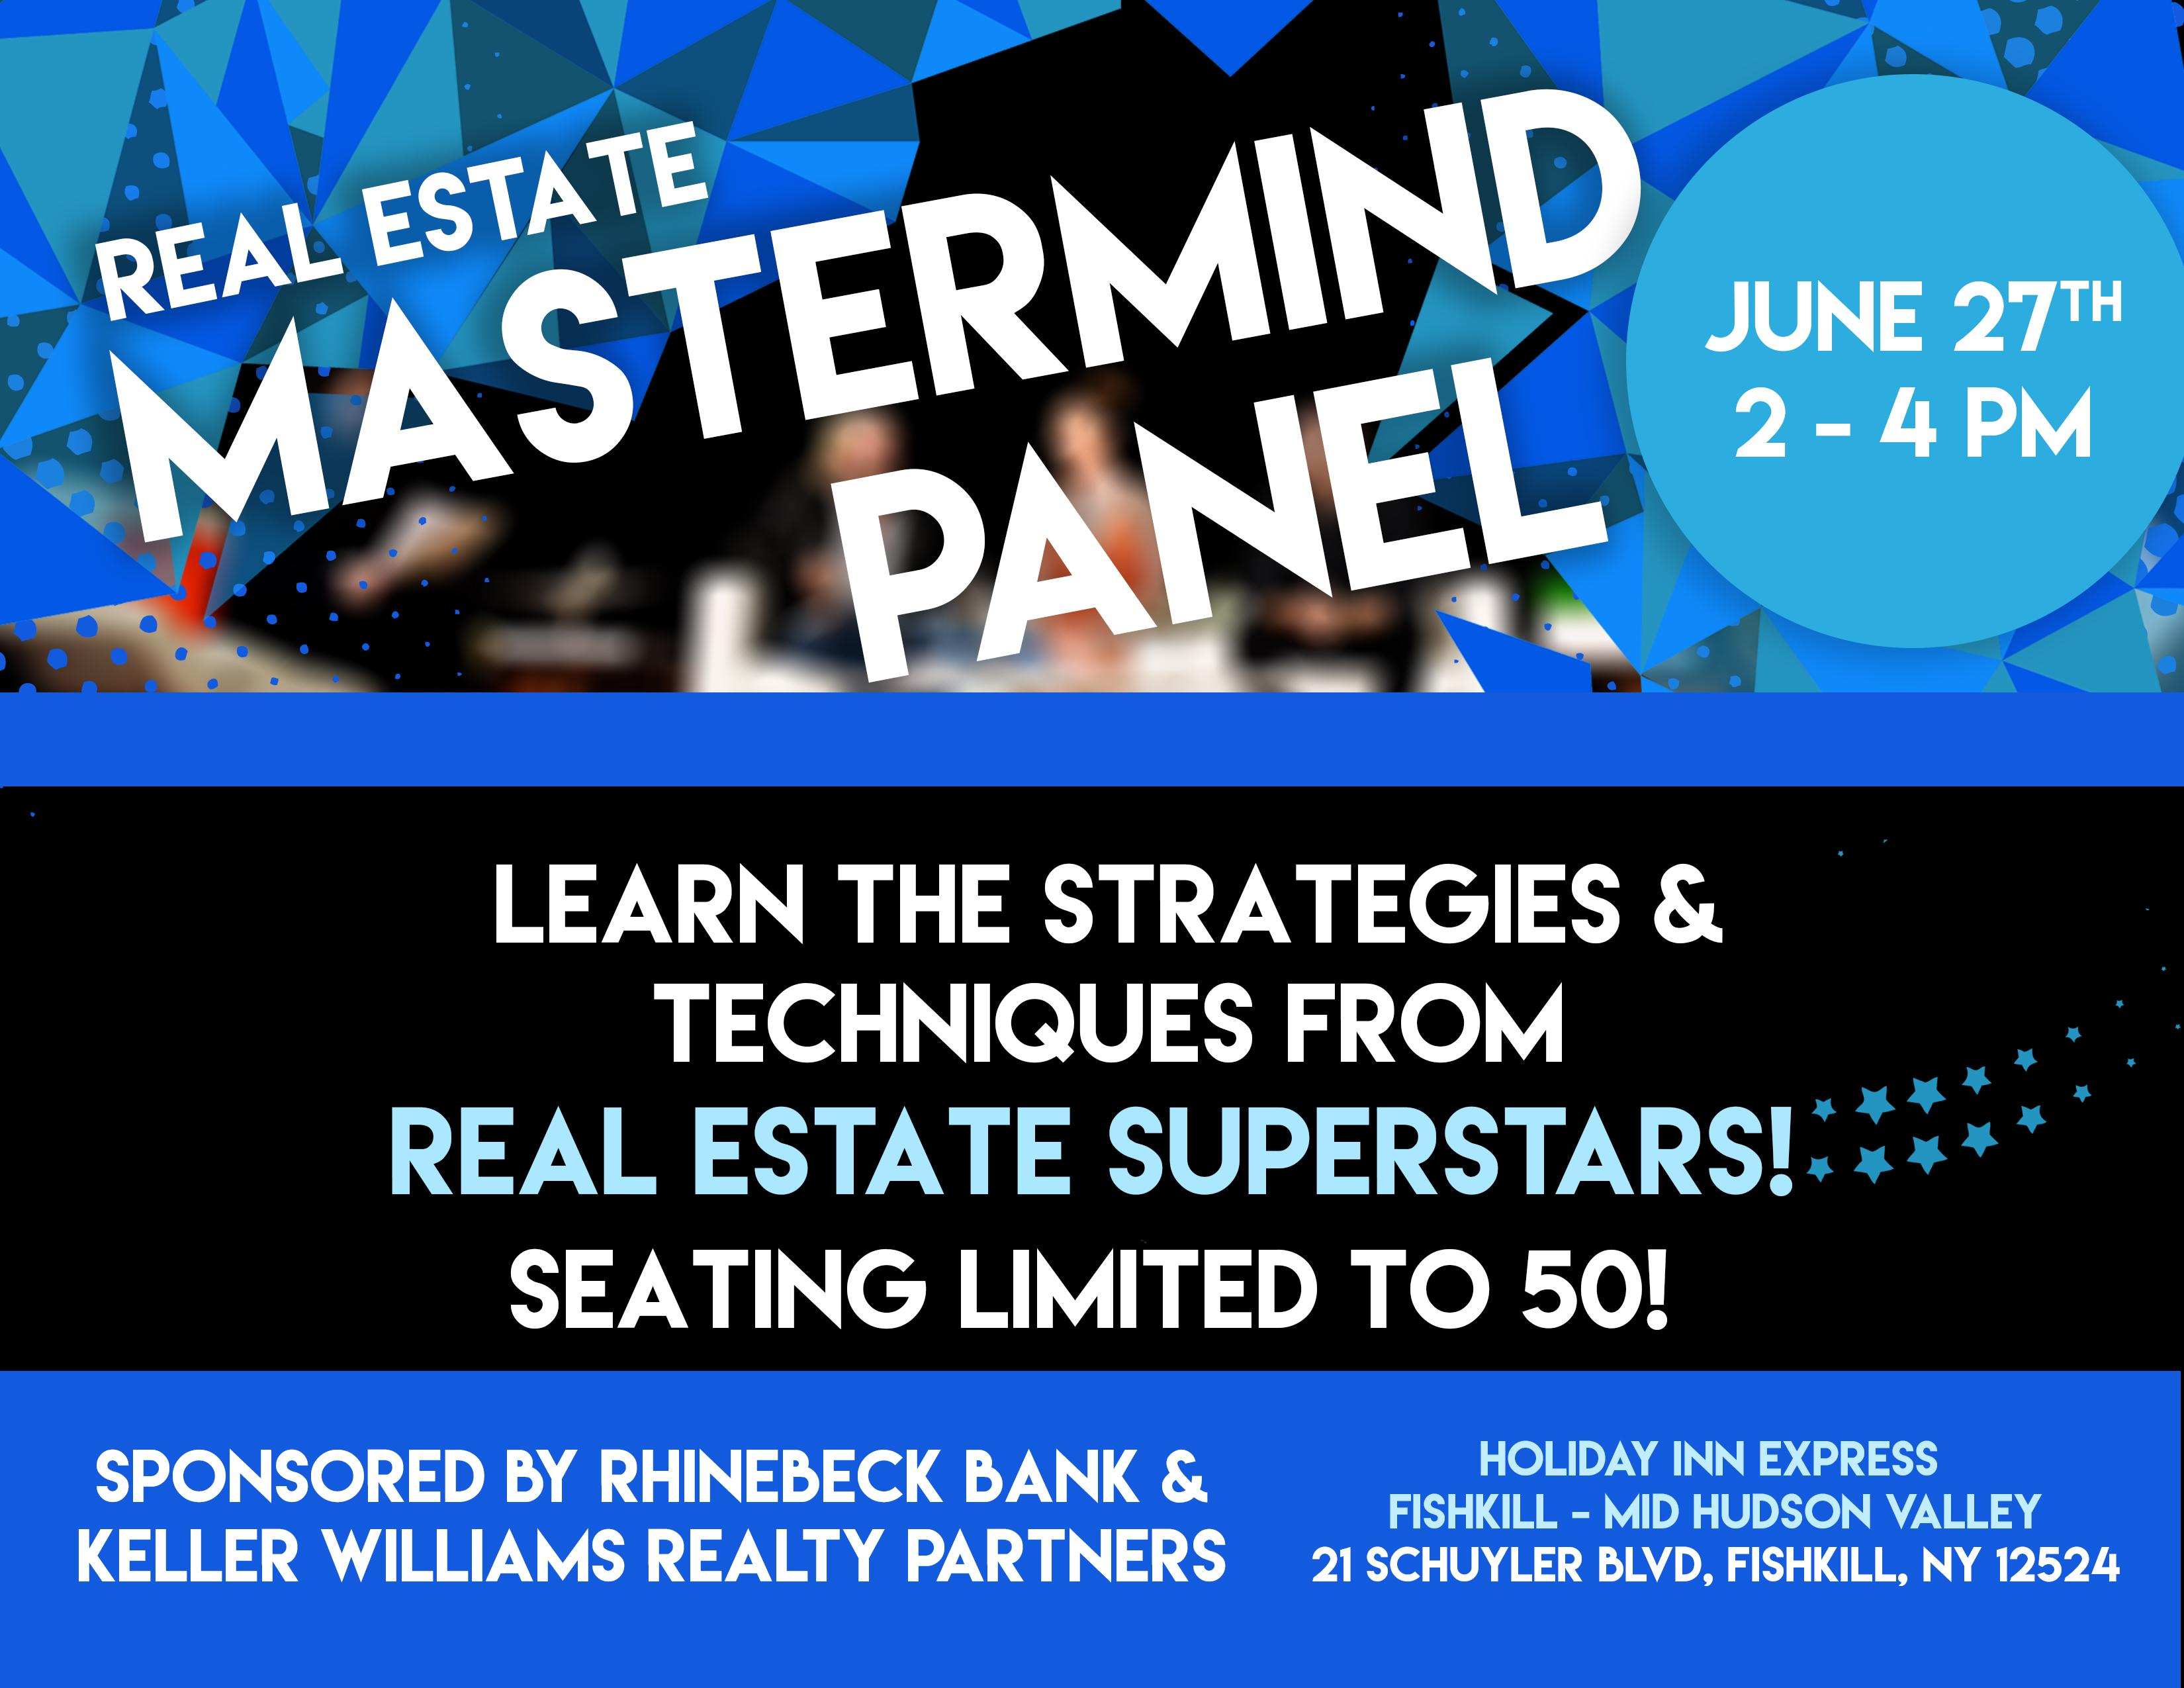 Real Estate MASTERMIND Panel